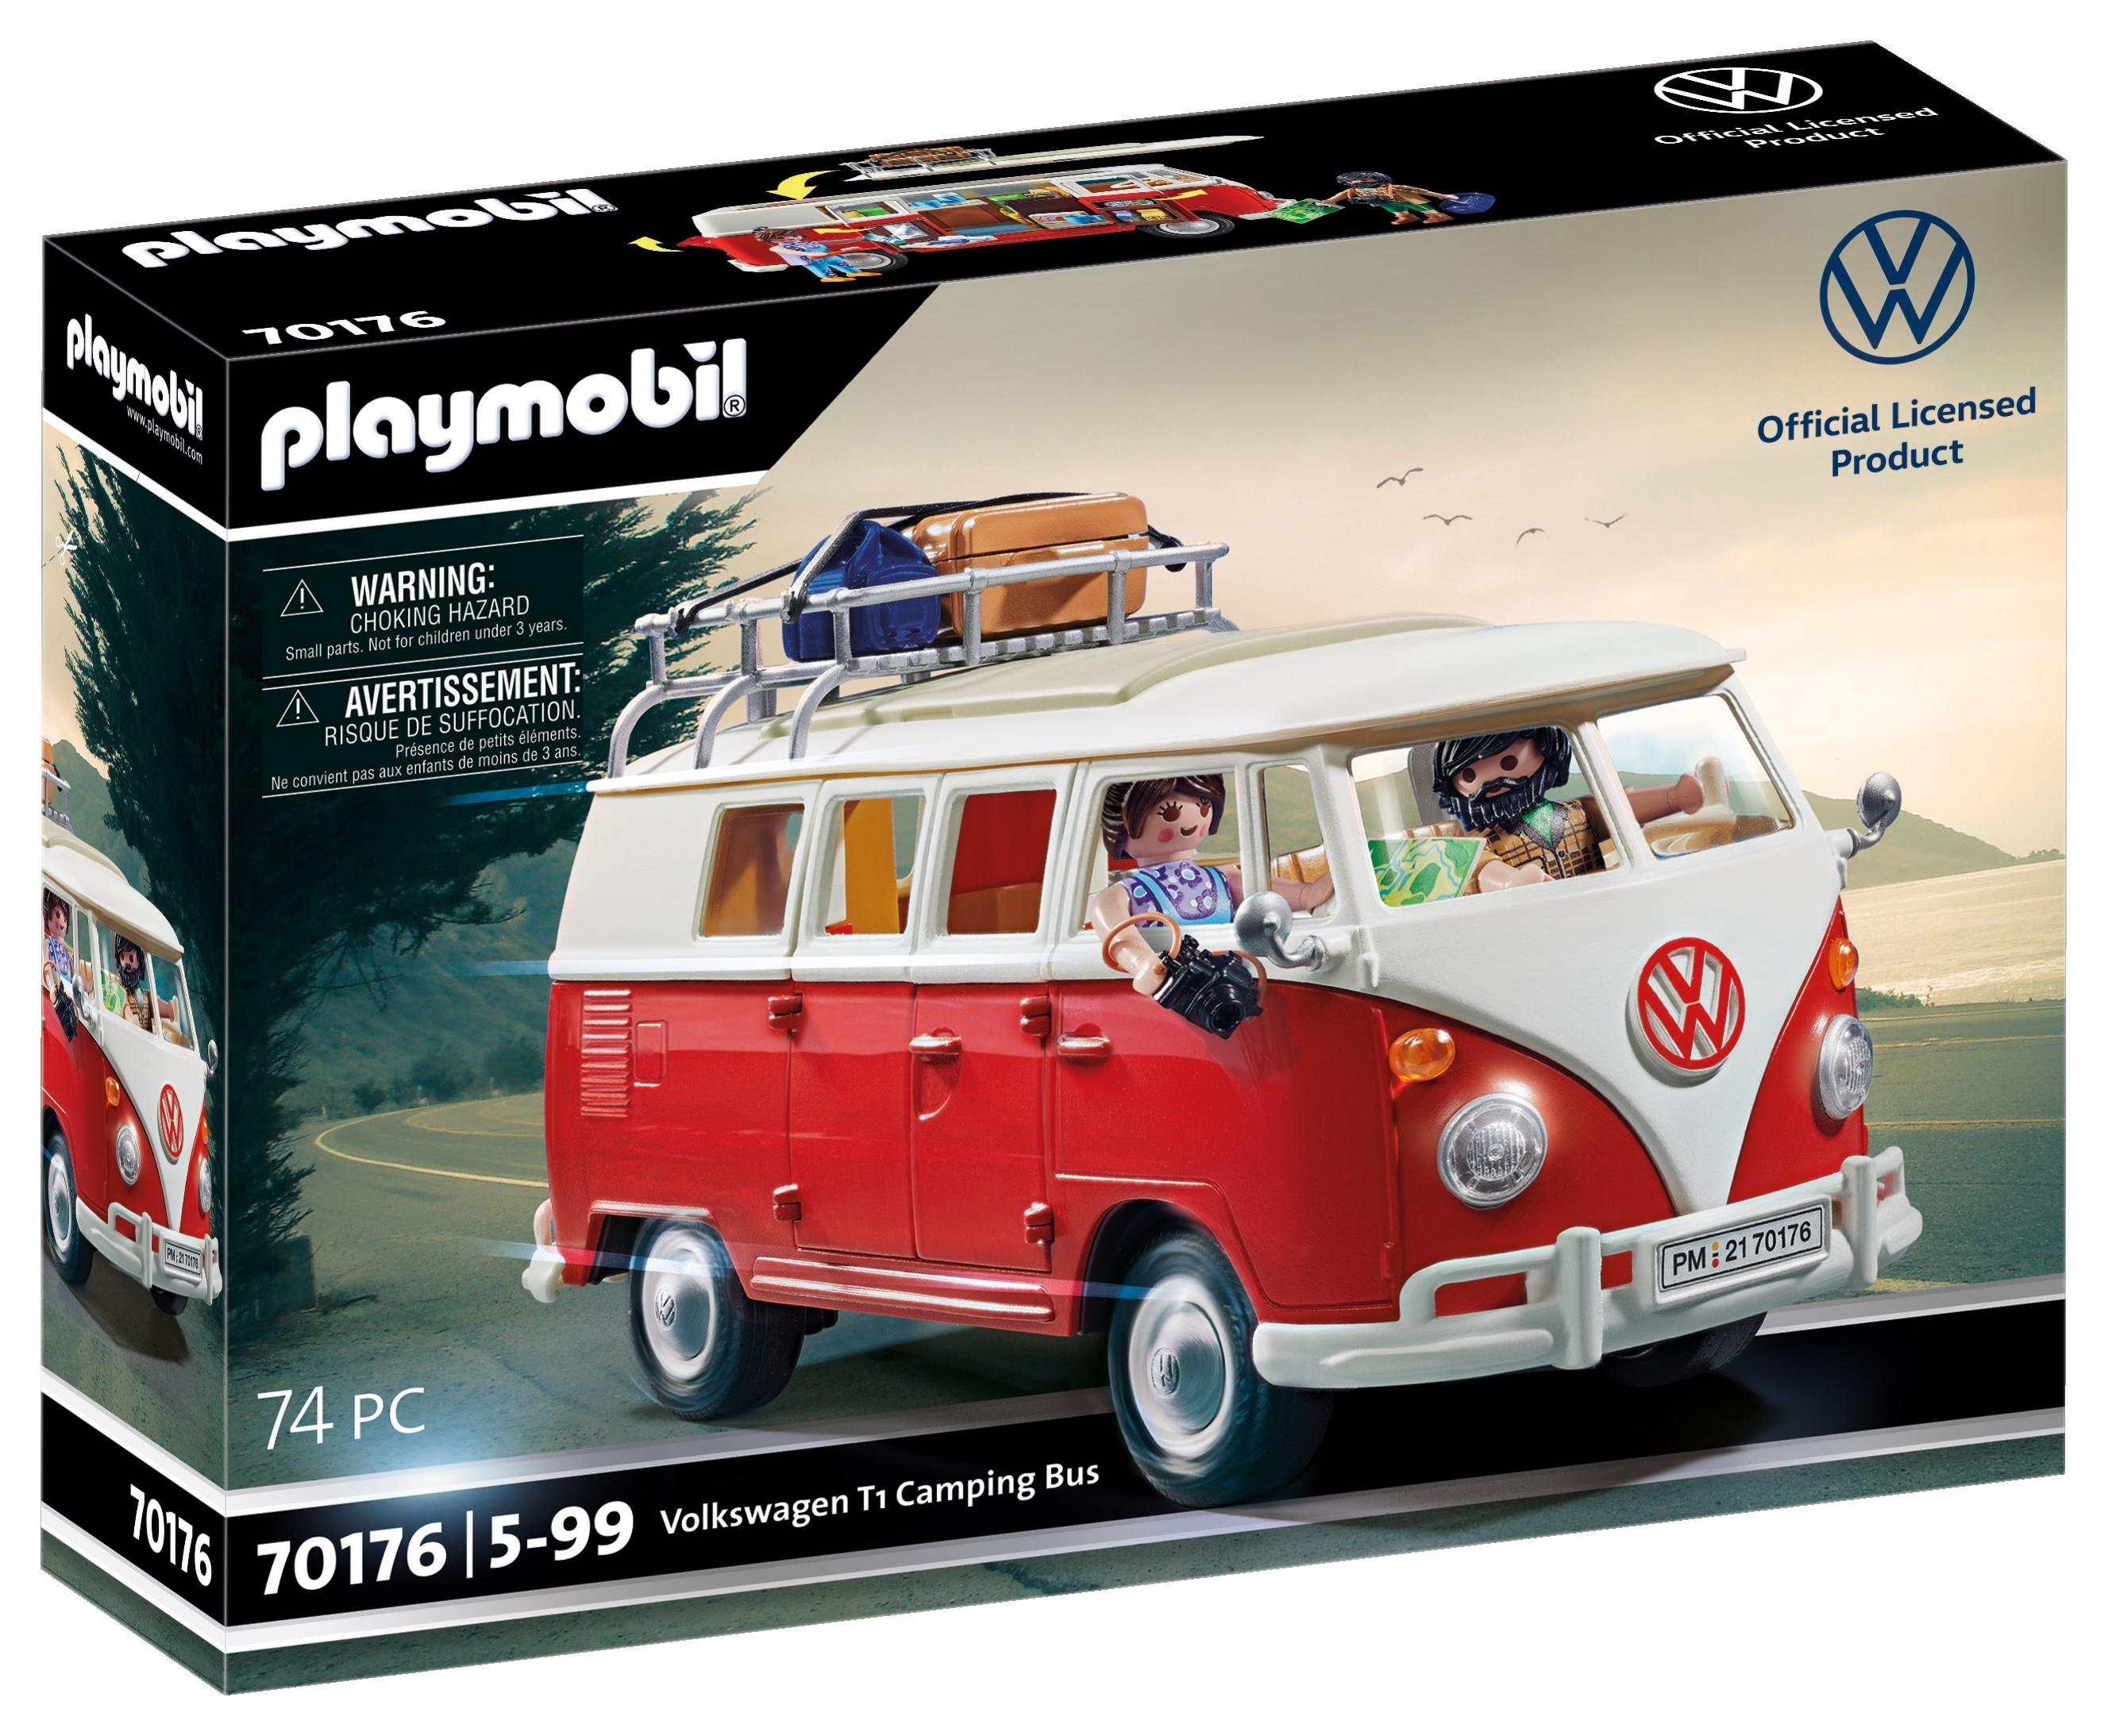 Playmobil VW: Volkswagen T1 Camping Bus (70176)